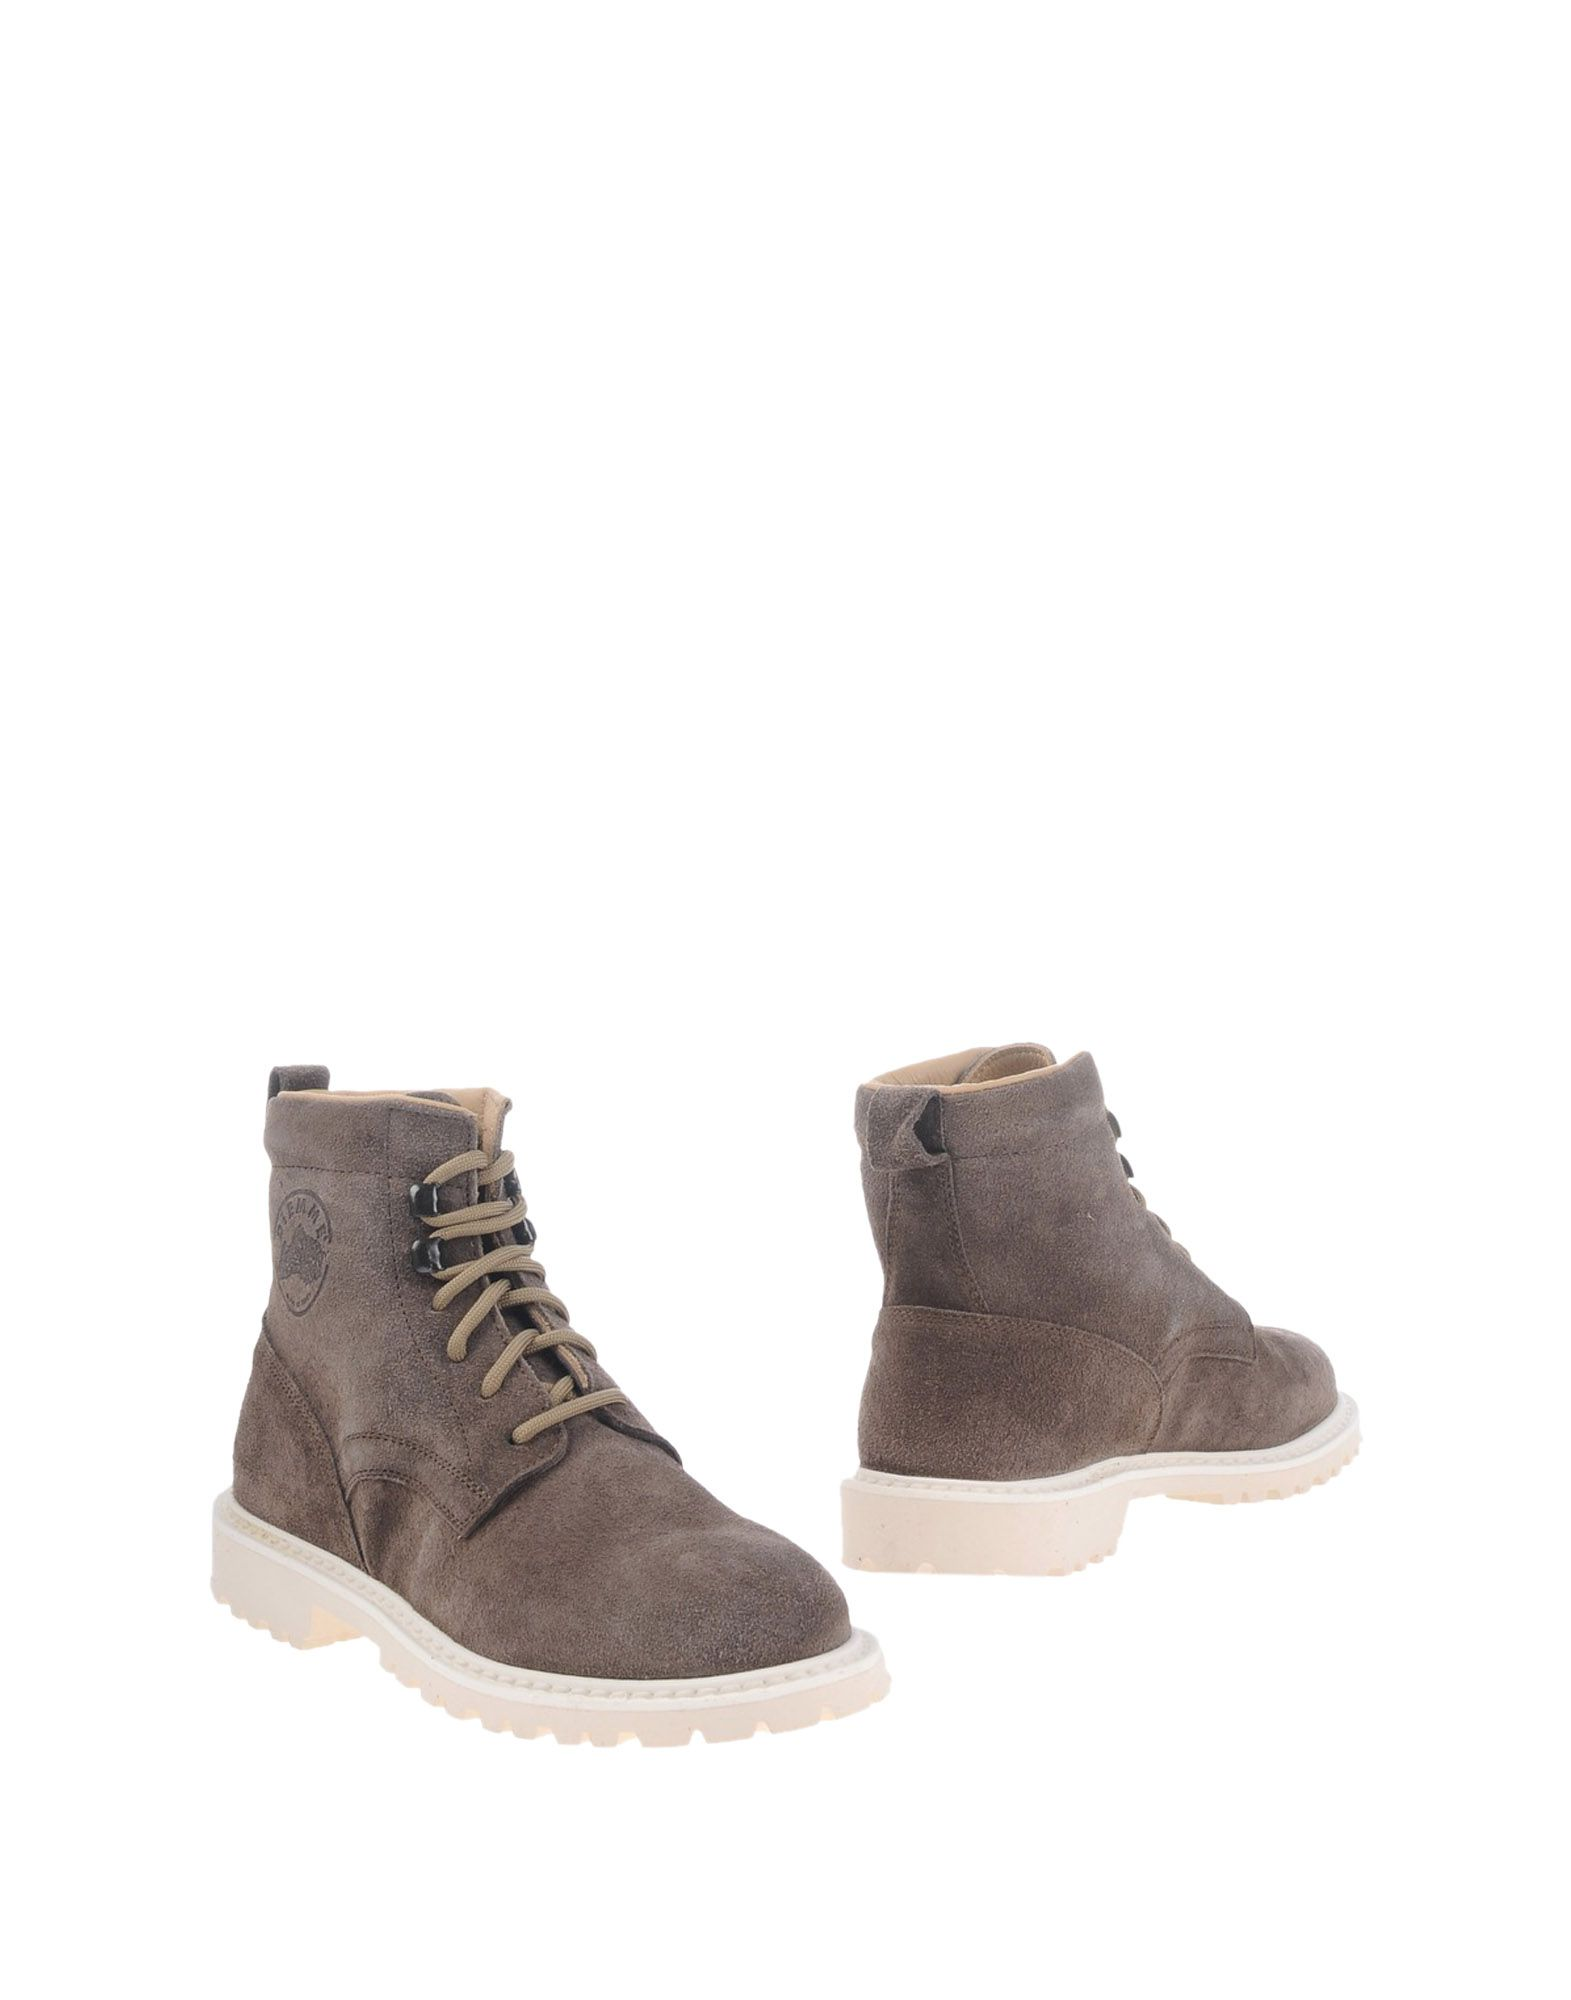 Gut Gut Gut um billige Schuhe zu tragenDiemme Stiefelette Damen  11223731AO acf02f